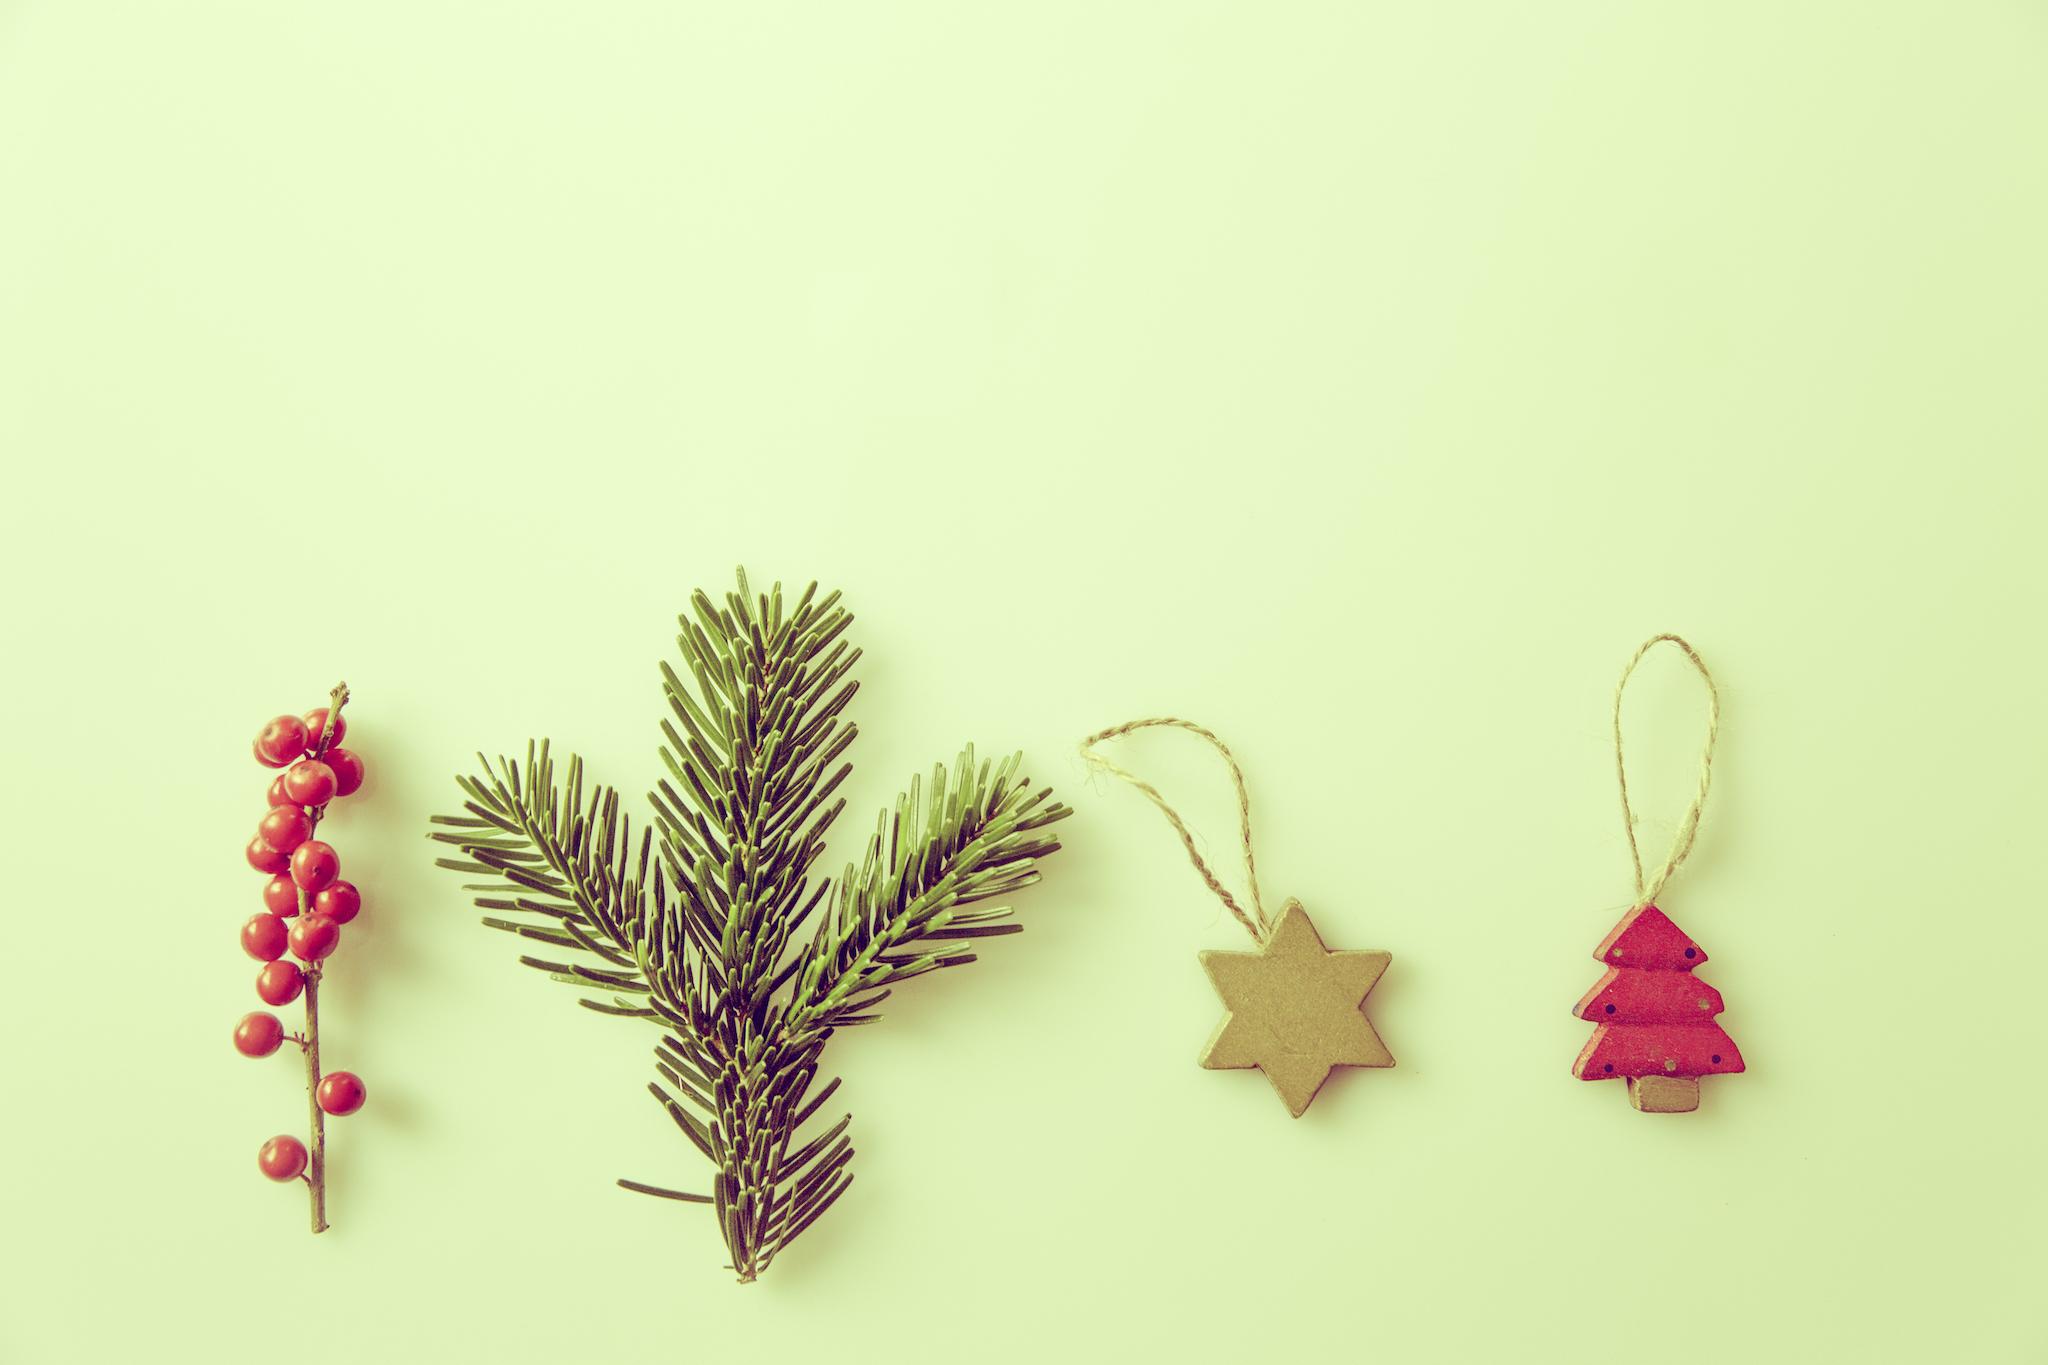 Holiday Ornament Making